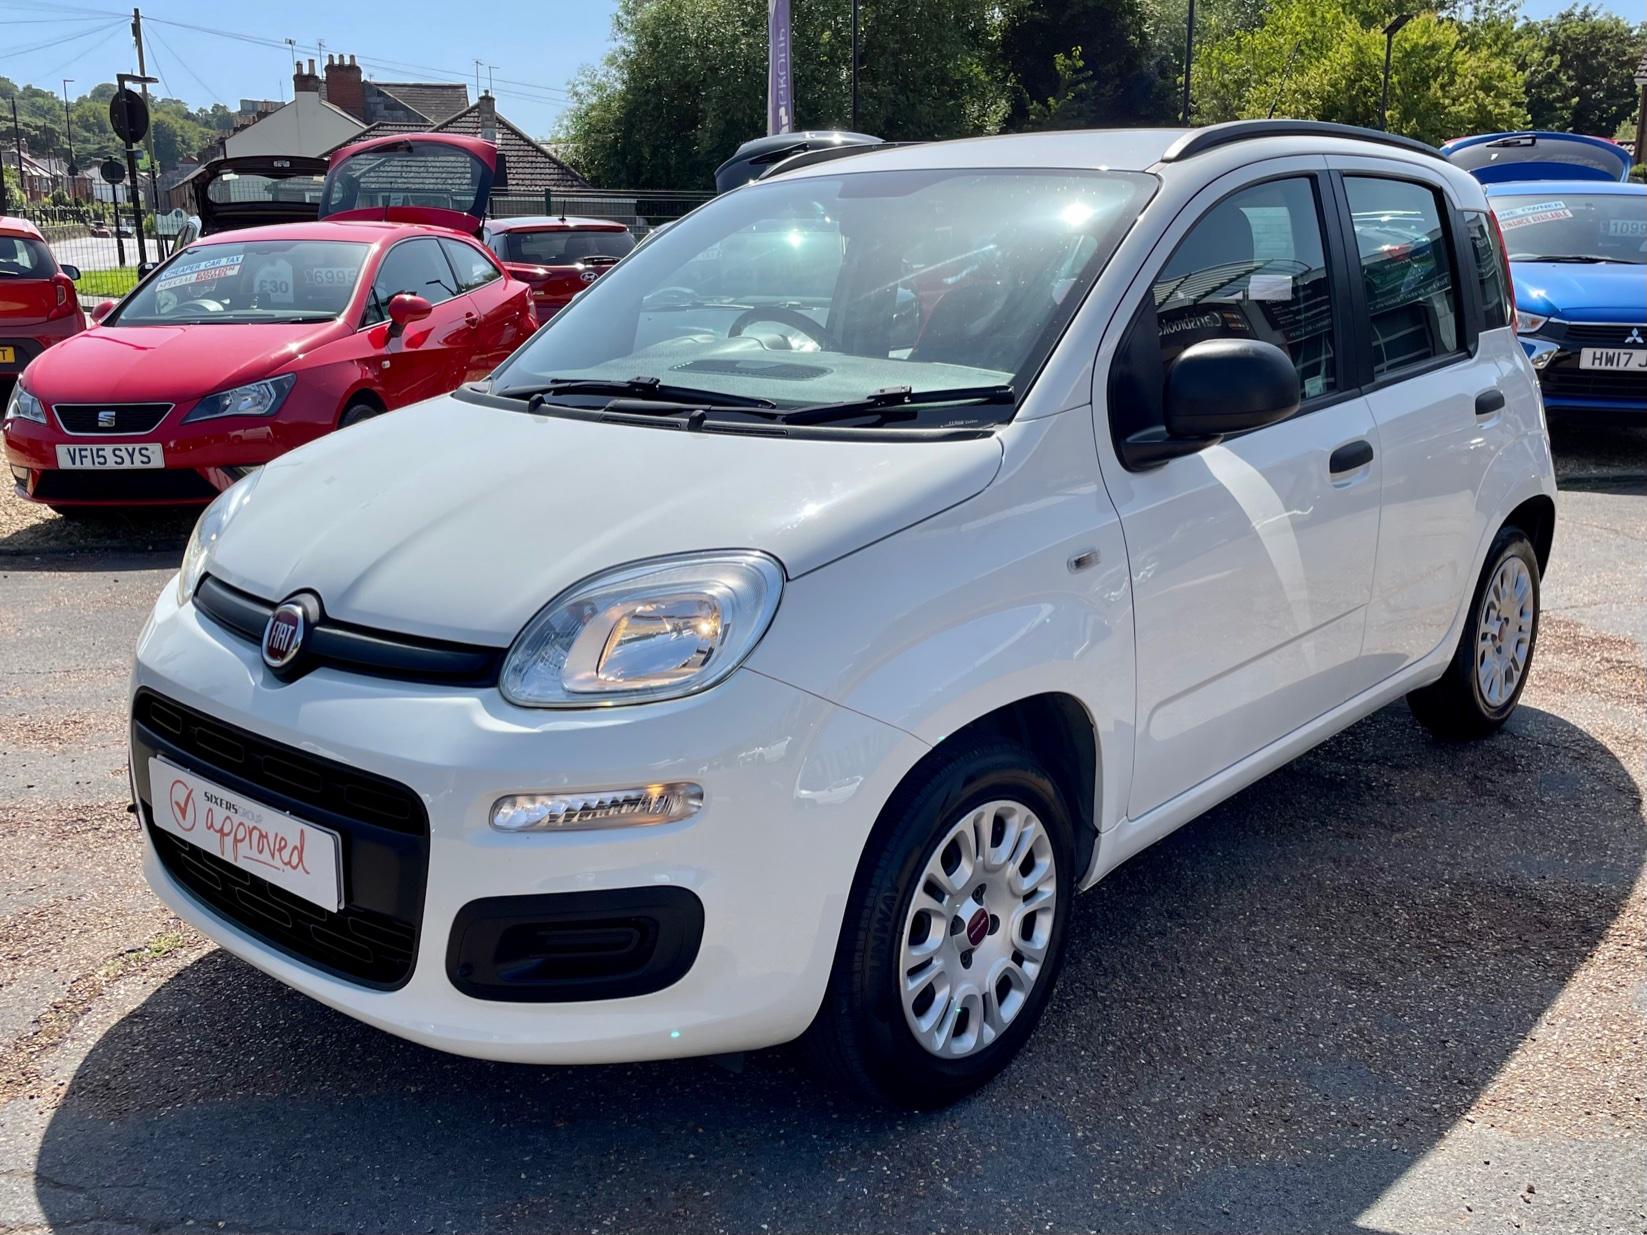 Car For Sale Fiat Panda - HK64EZV Sixers Group Image #6